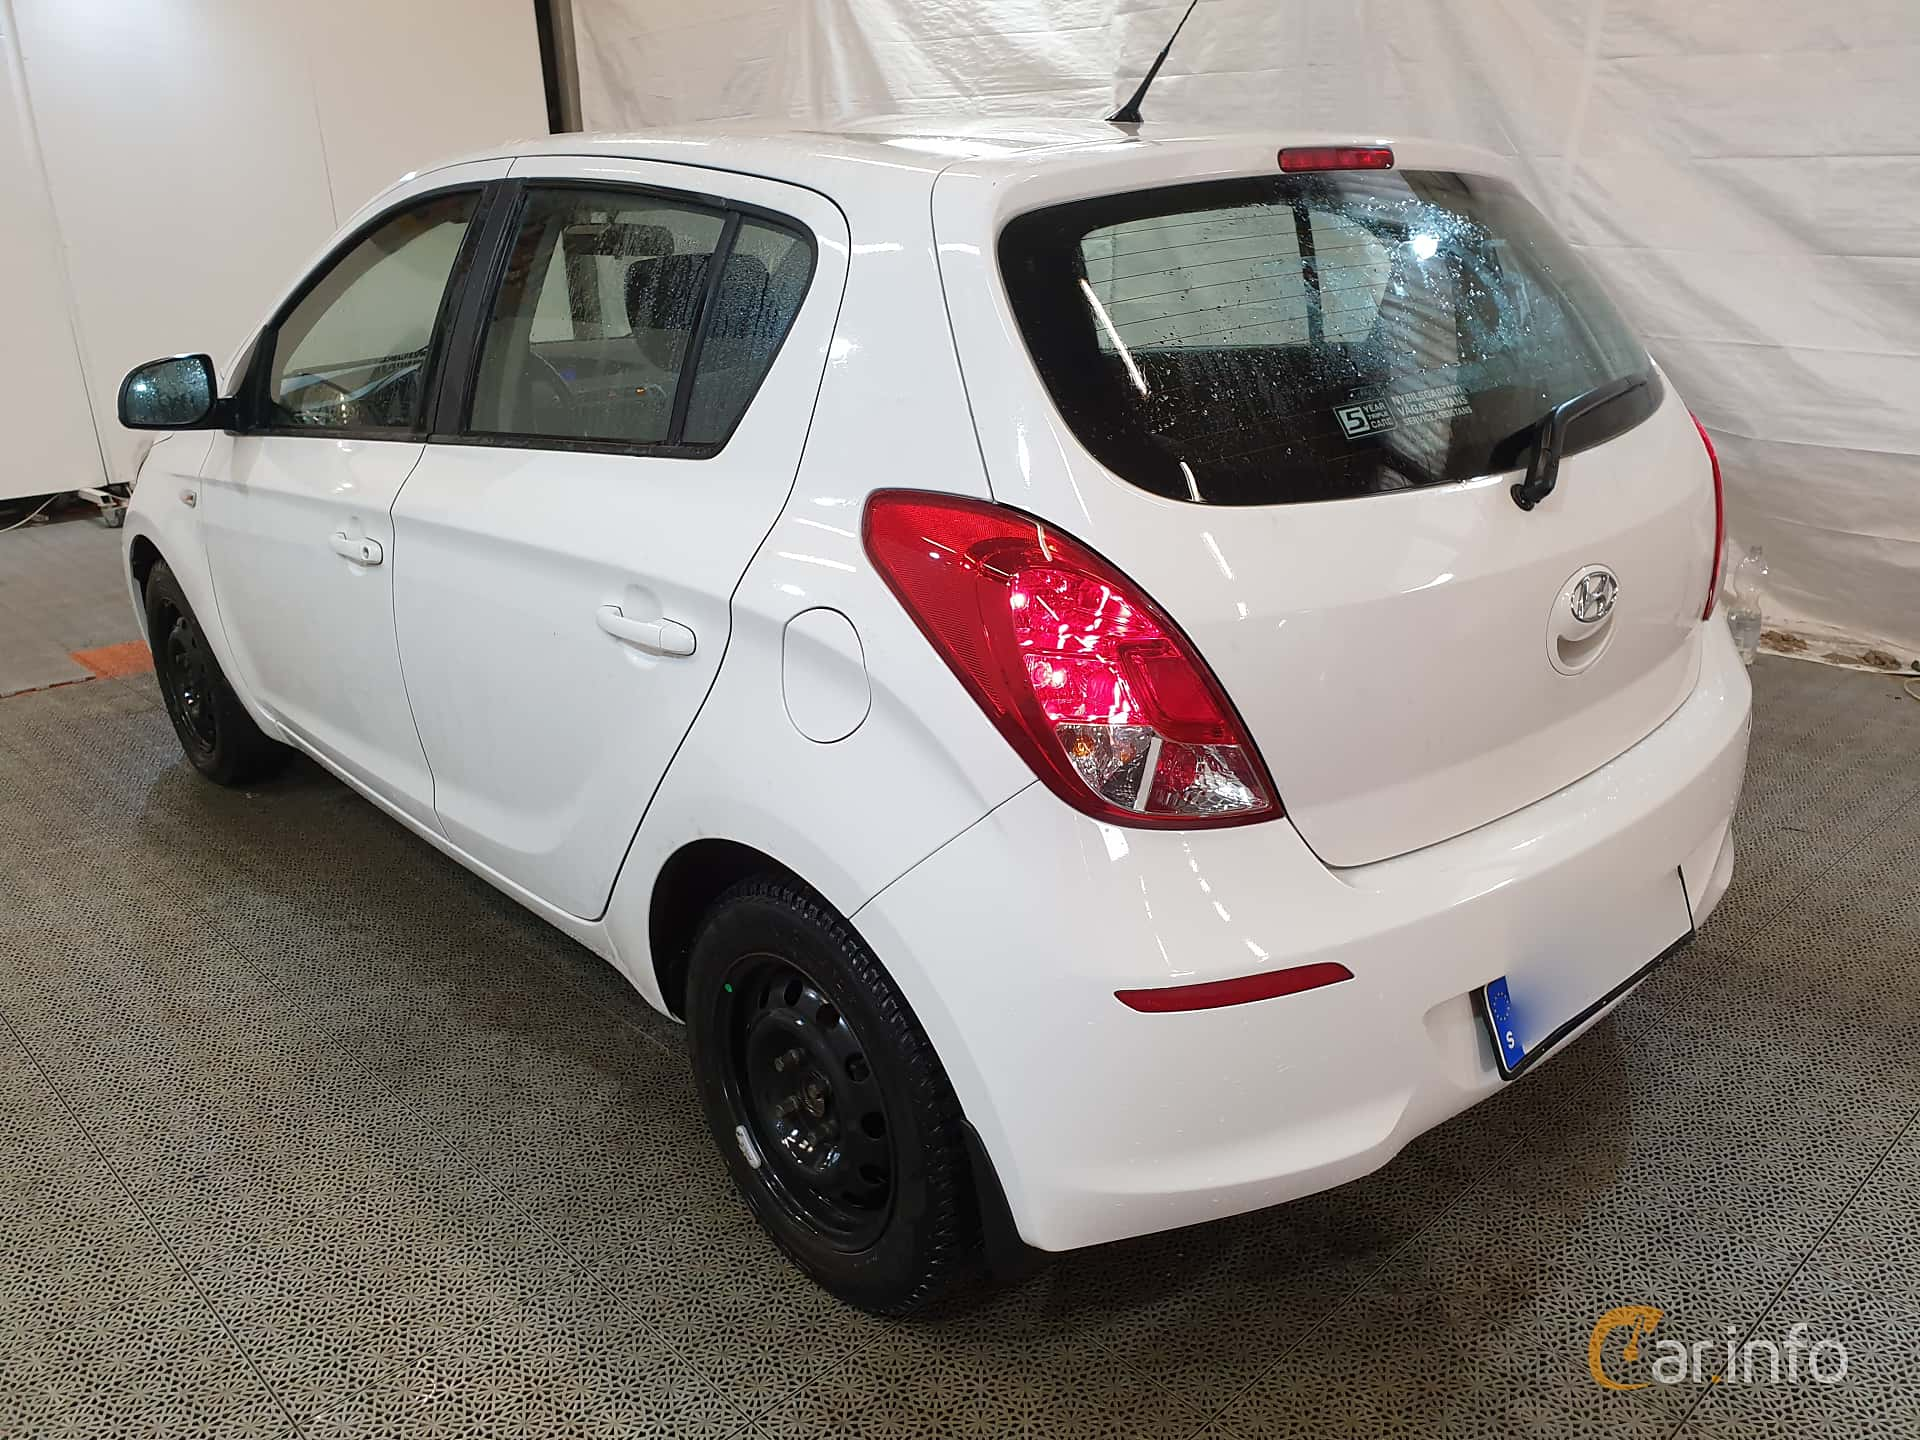 Hyundai i20 5-dörrar 1.2 Manuell, 86hk, 2013